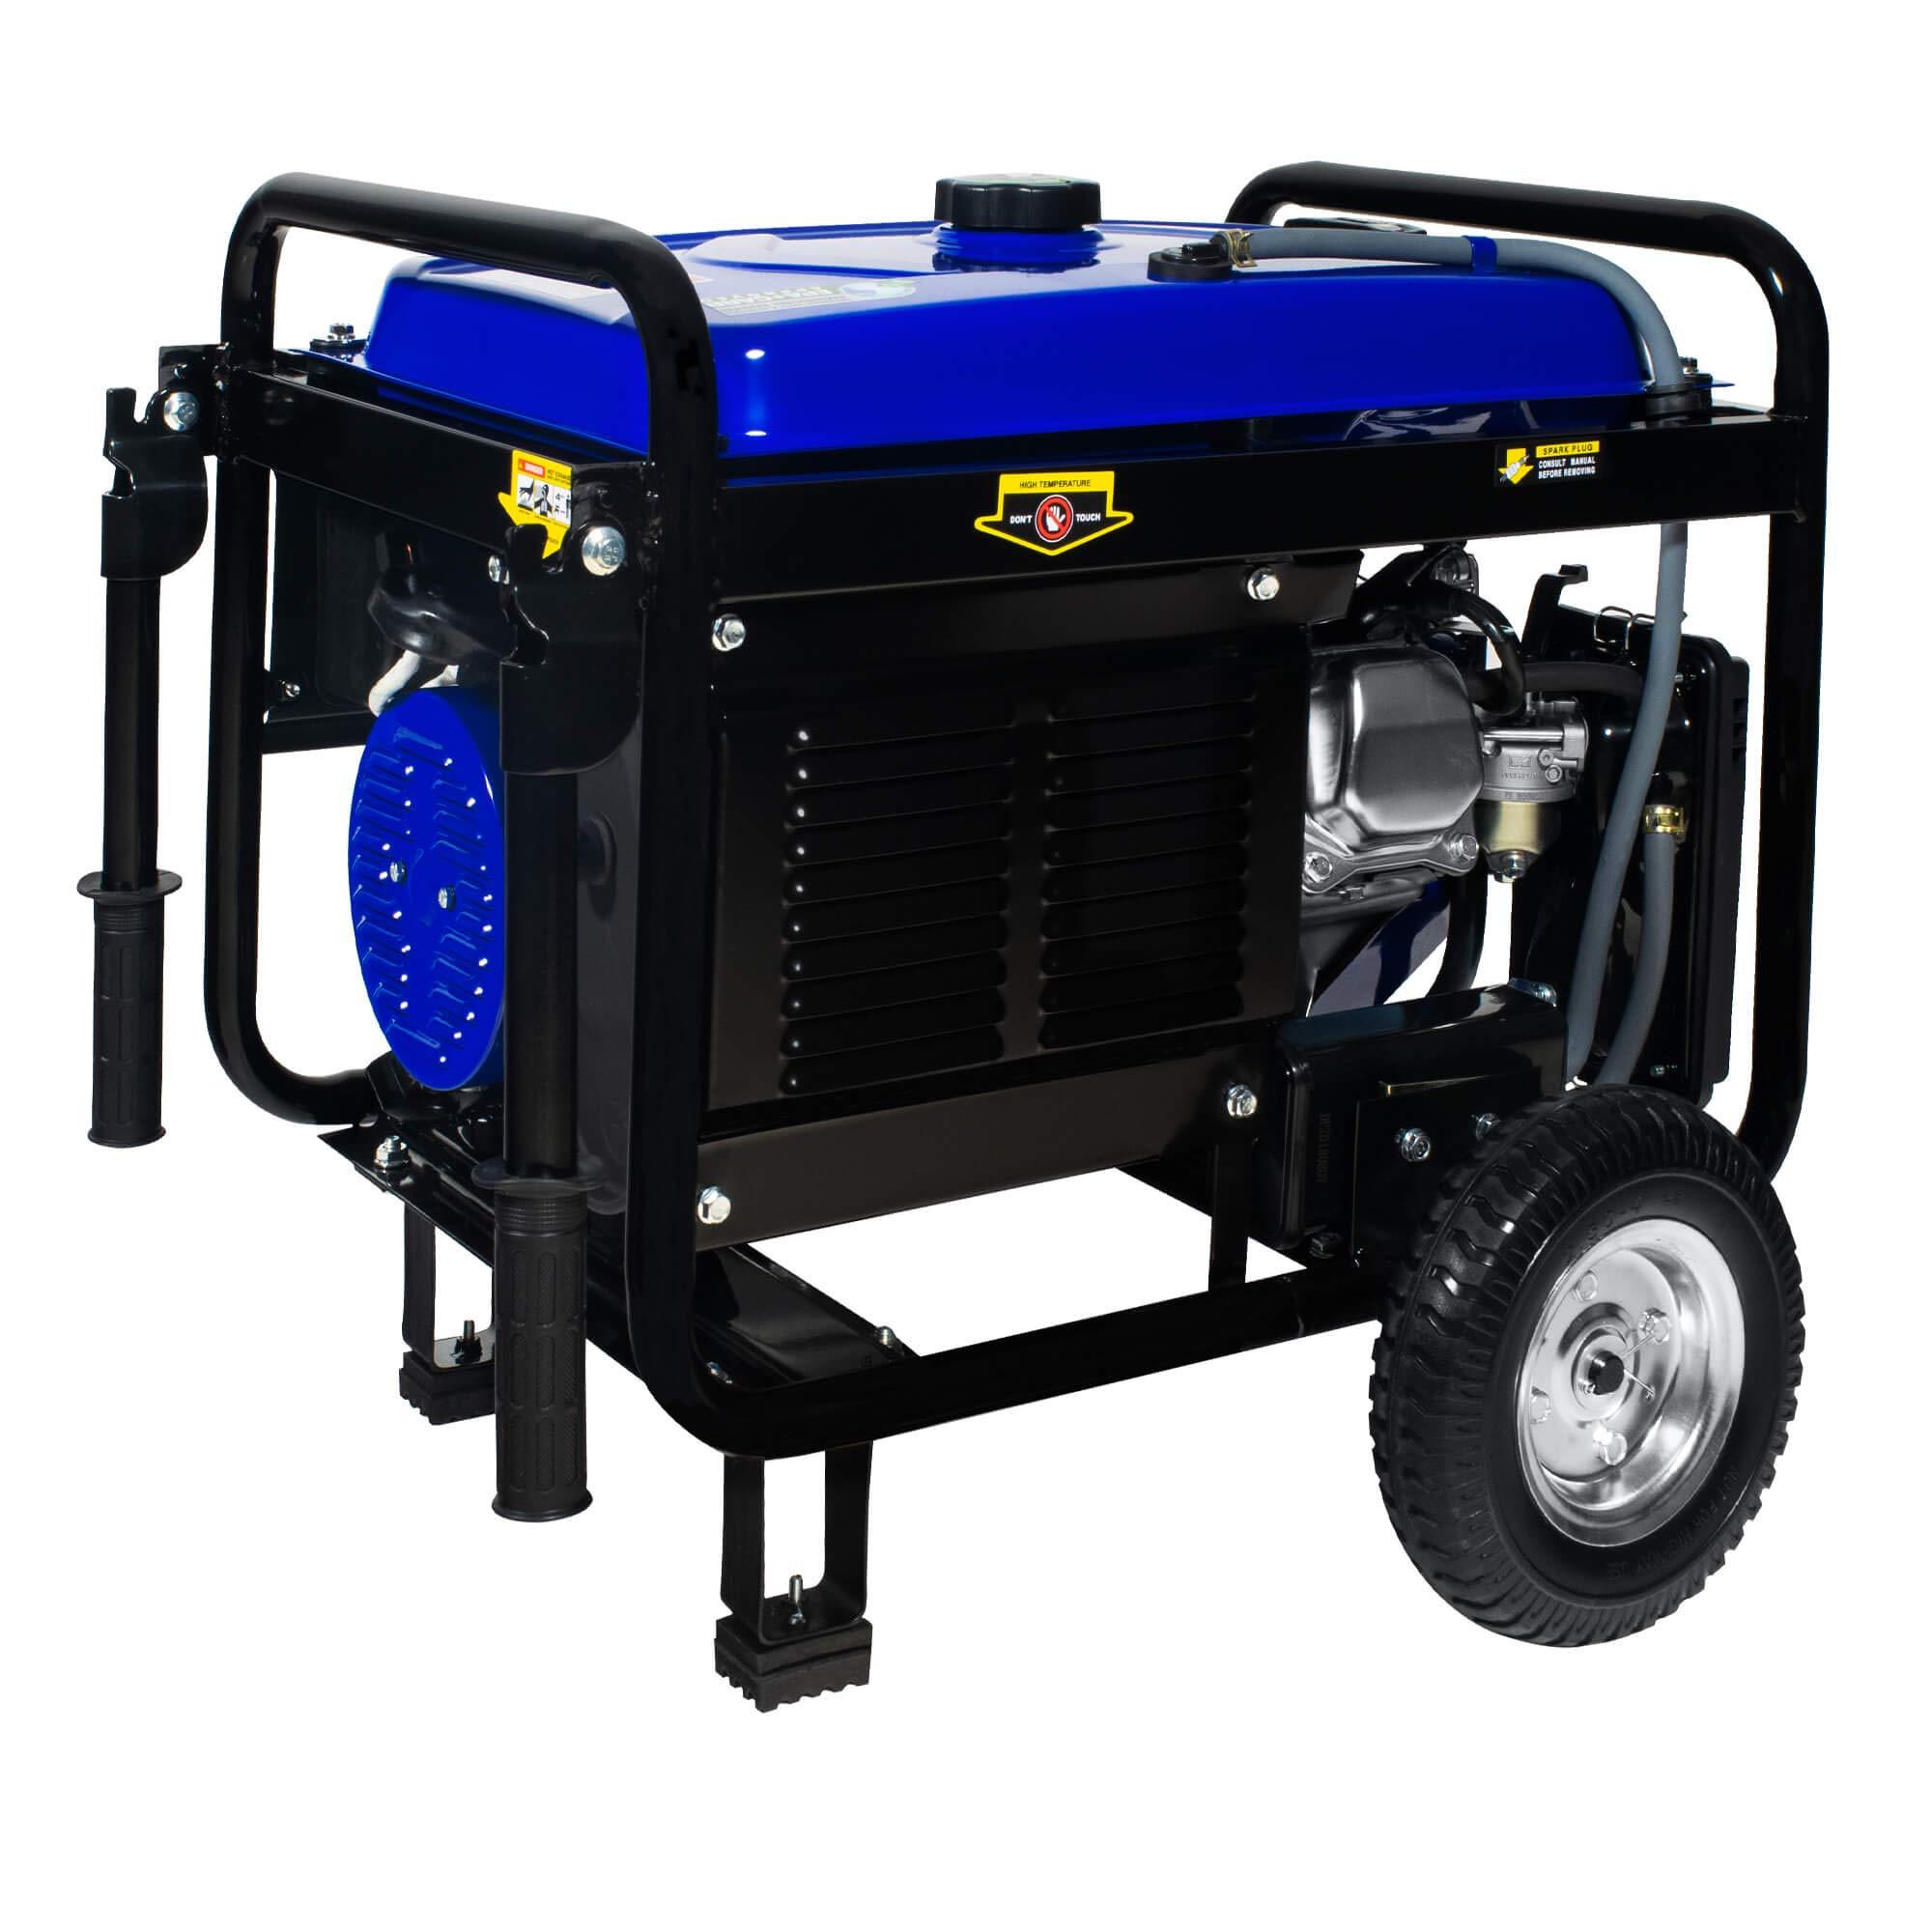 DuroMax Hybrid Dual Fuel XP4400EH 4,400-Watt Portable Generator by DuroMax (Image #10)